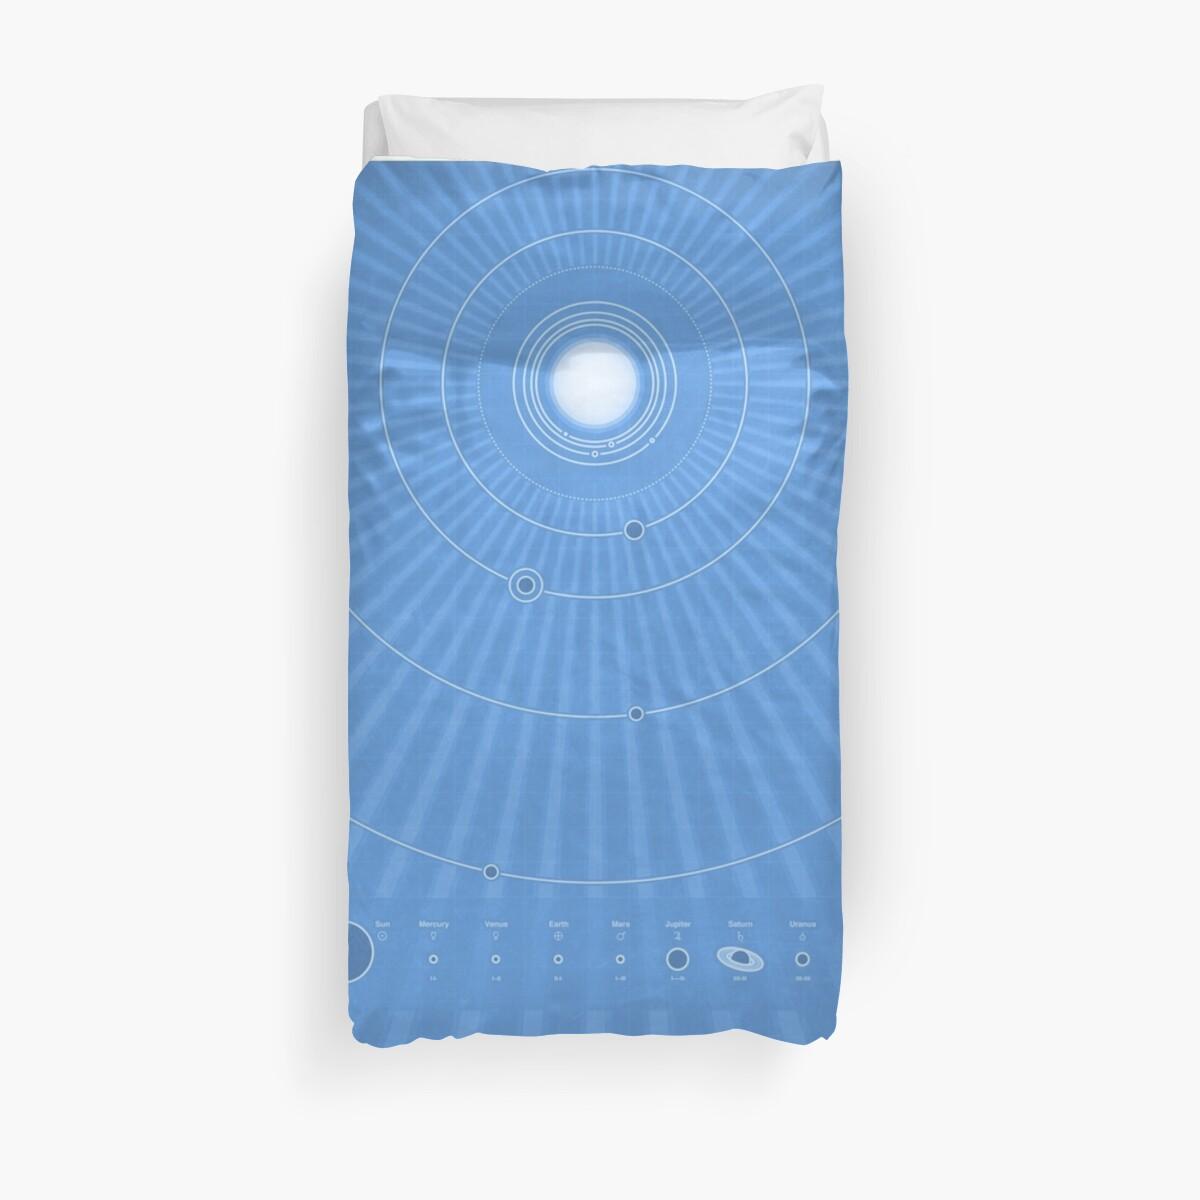 Solar System Cool - portrait by Pig's Ear Gear